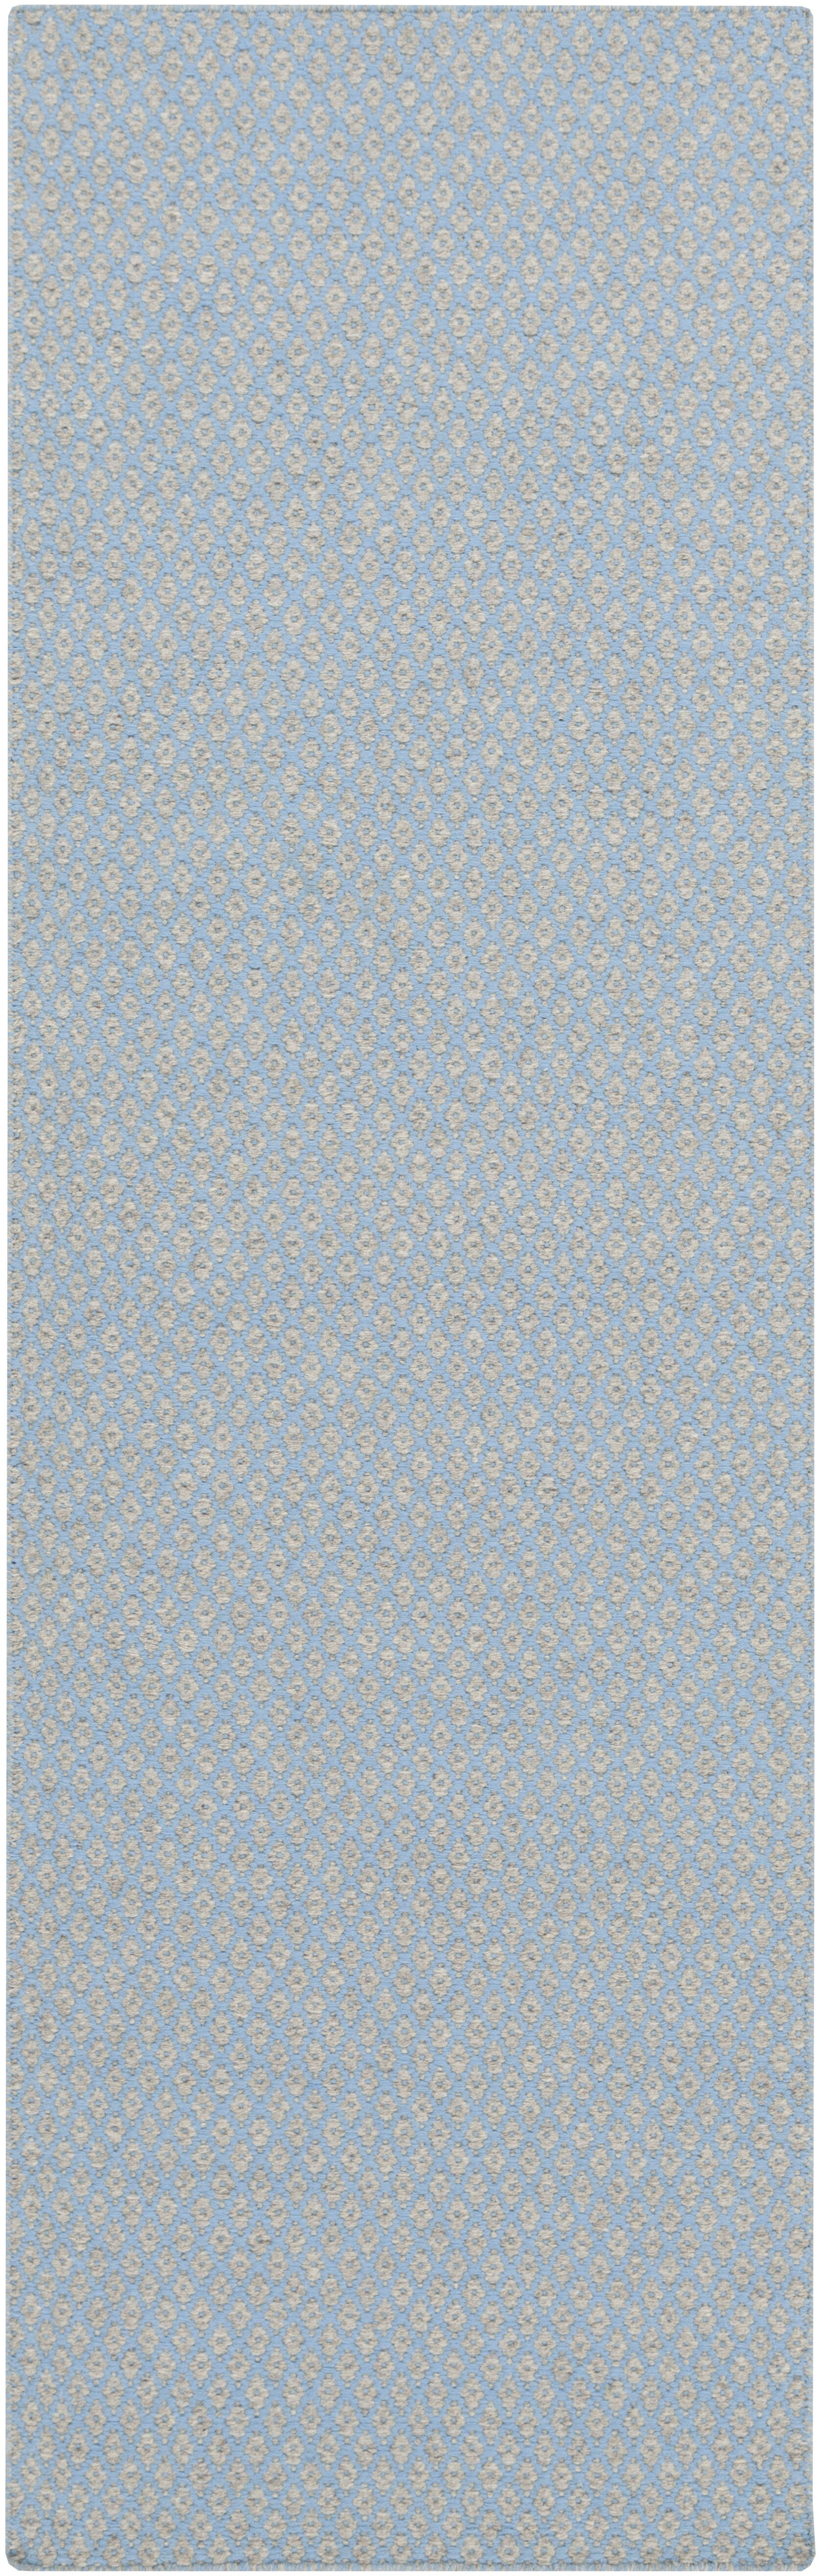 Walton Sky Blue Area Rug Rug Size: Rectangle 2' x 3'